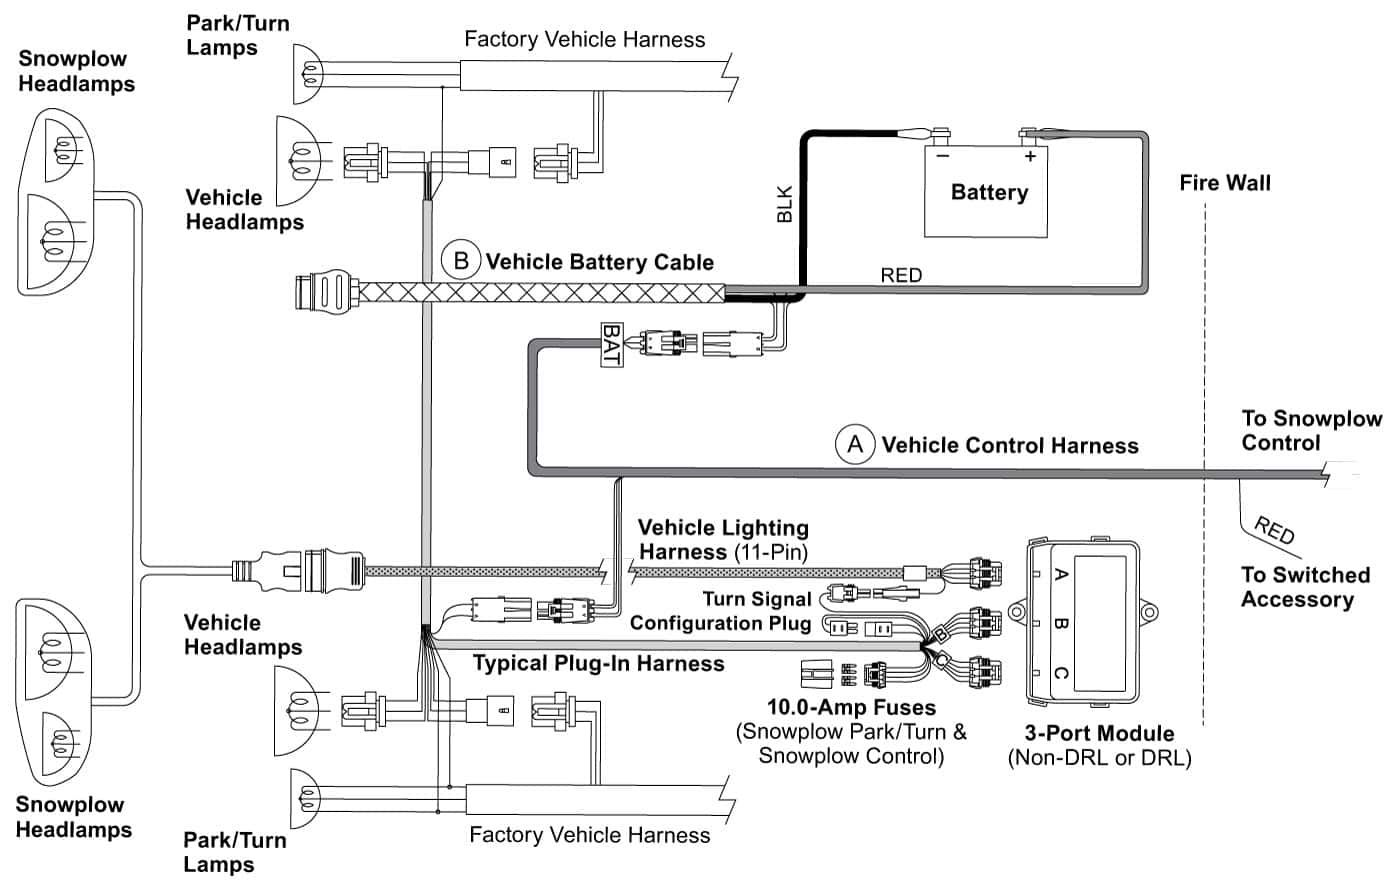 hdxvsh?resize\\\\\\\\\\\\\\\\\\\\\\\\\\\\\\\=665%2C423 boss fs 6 wiring diagram polaris trail boss wiring diagram  at gsmx.co